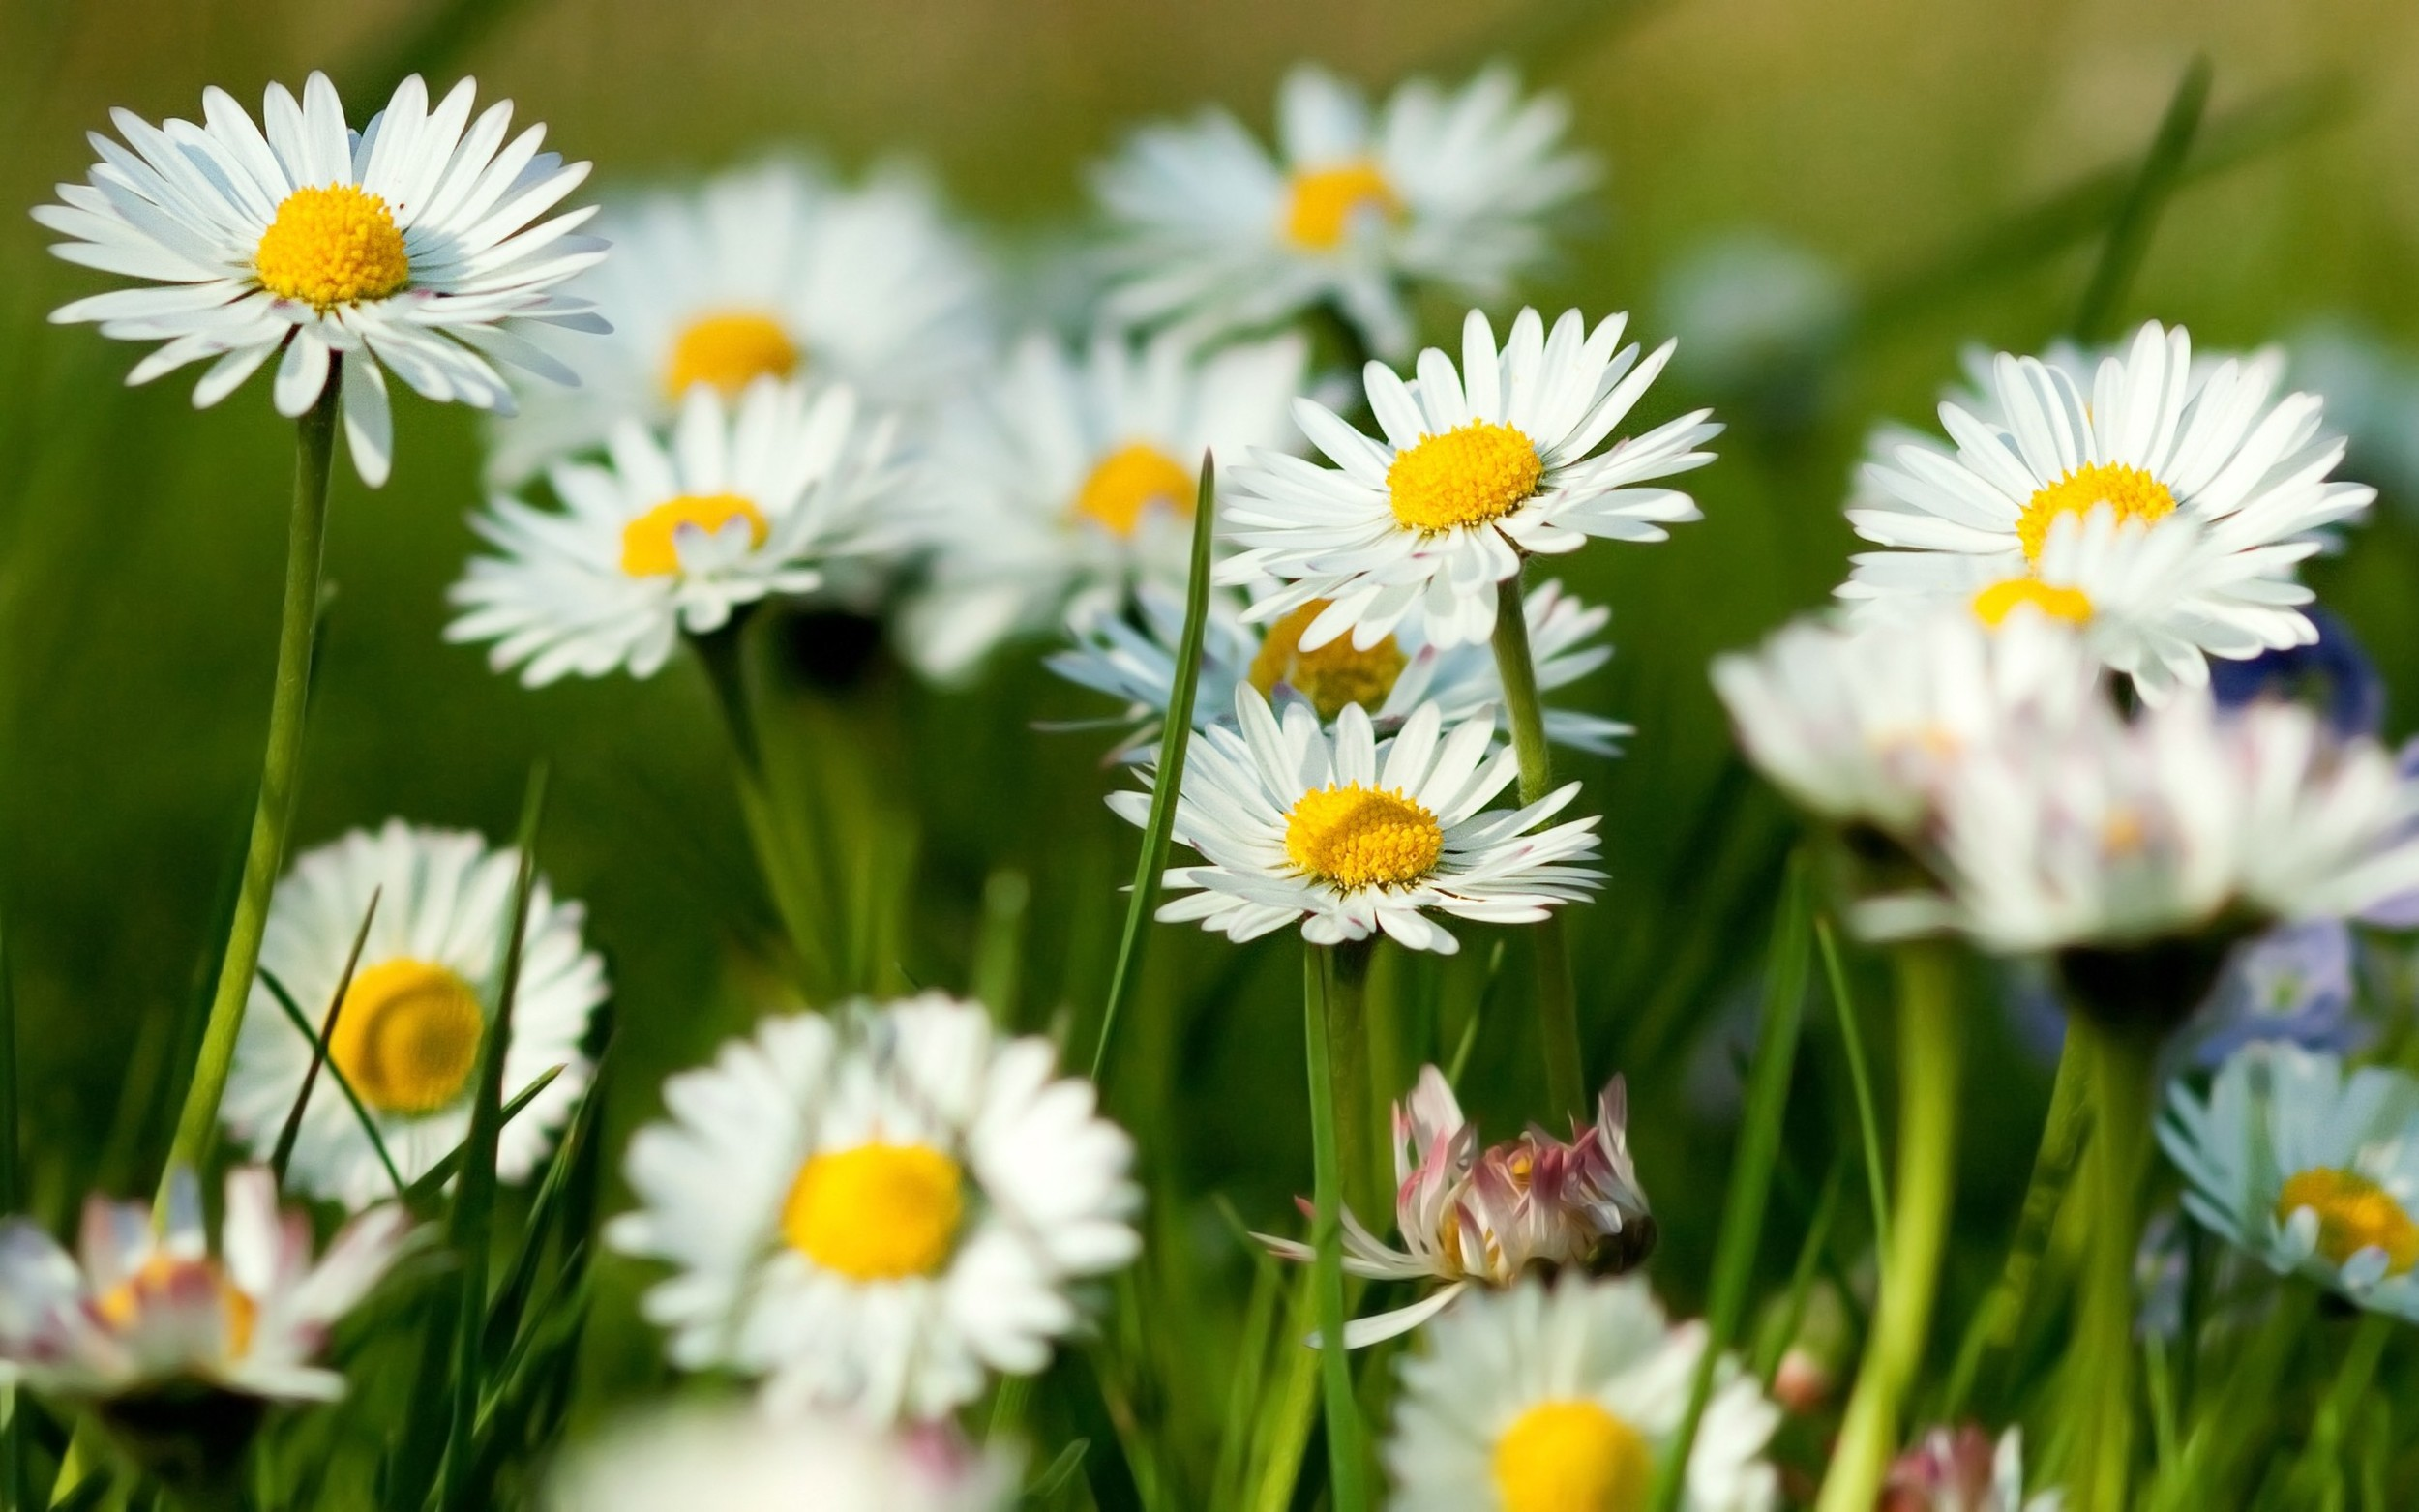 chamomile-flowers-summer-grass-herbs1st.jpg